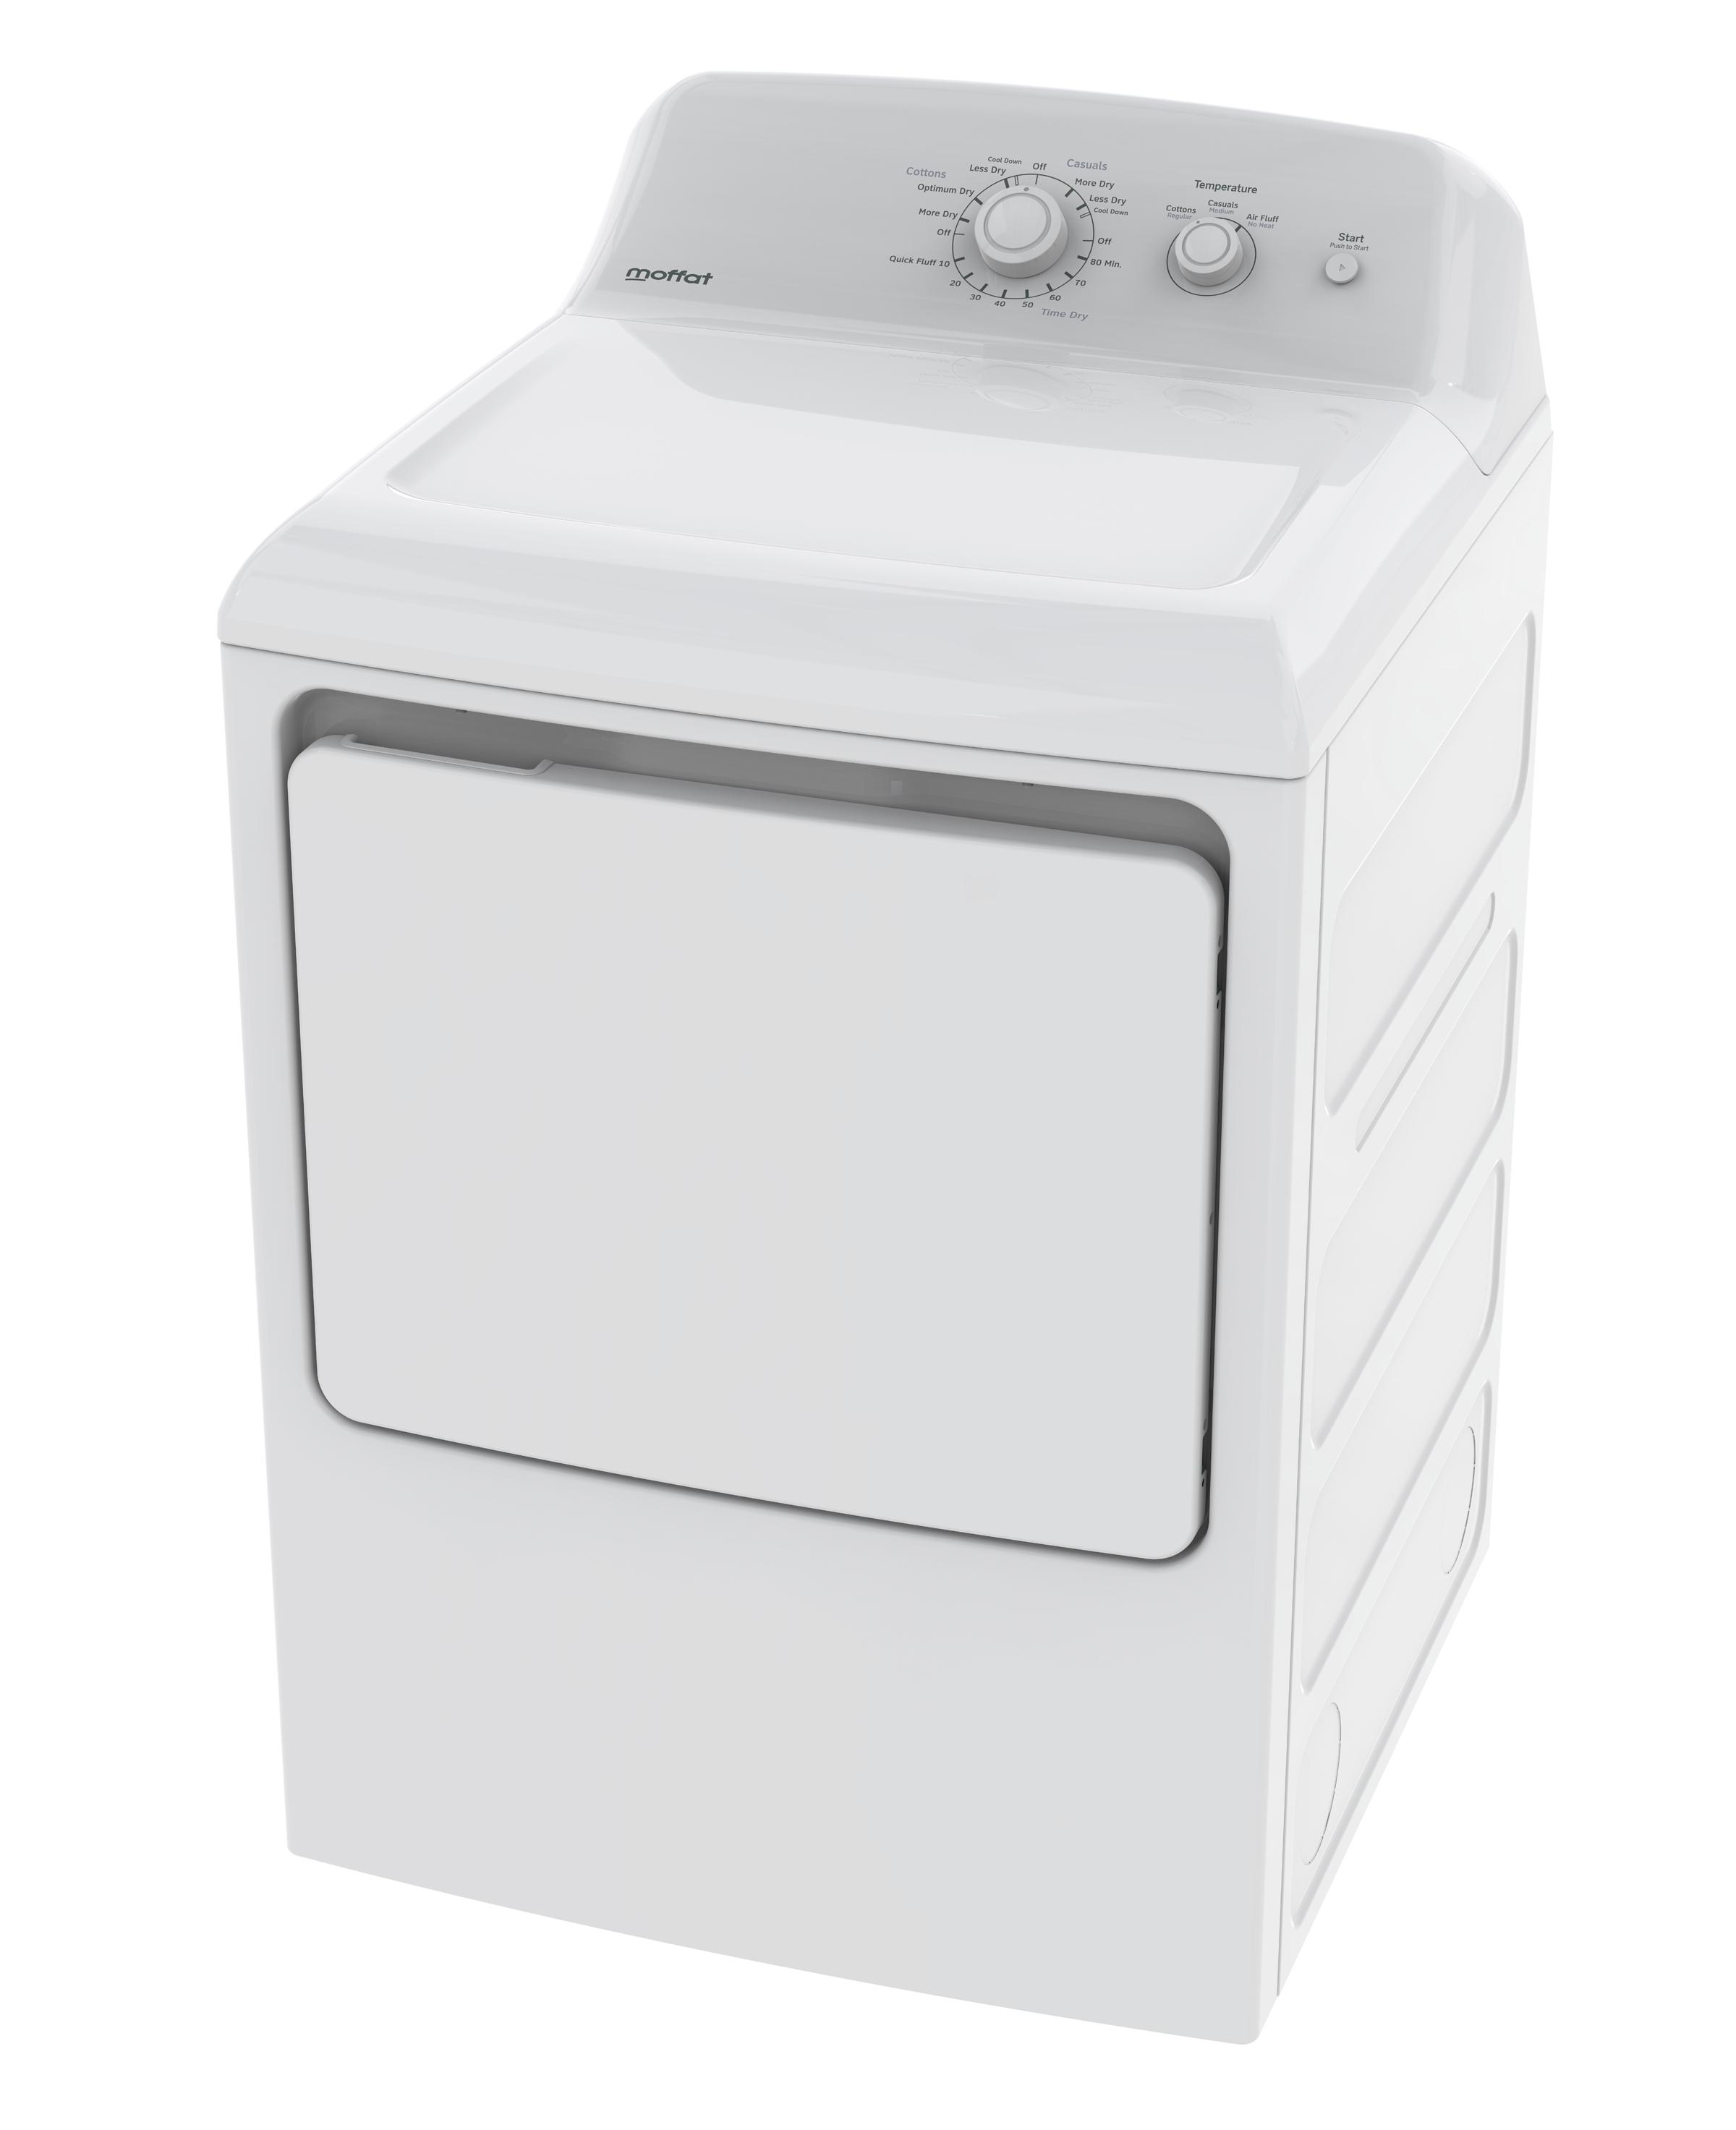 21373 – dryer – MTX22EBMKWW – side